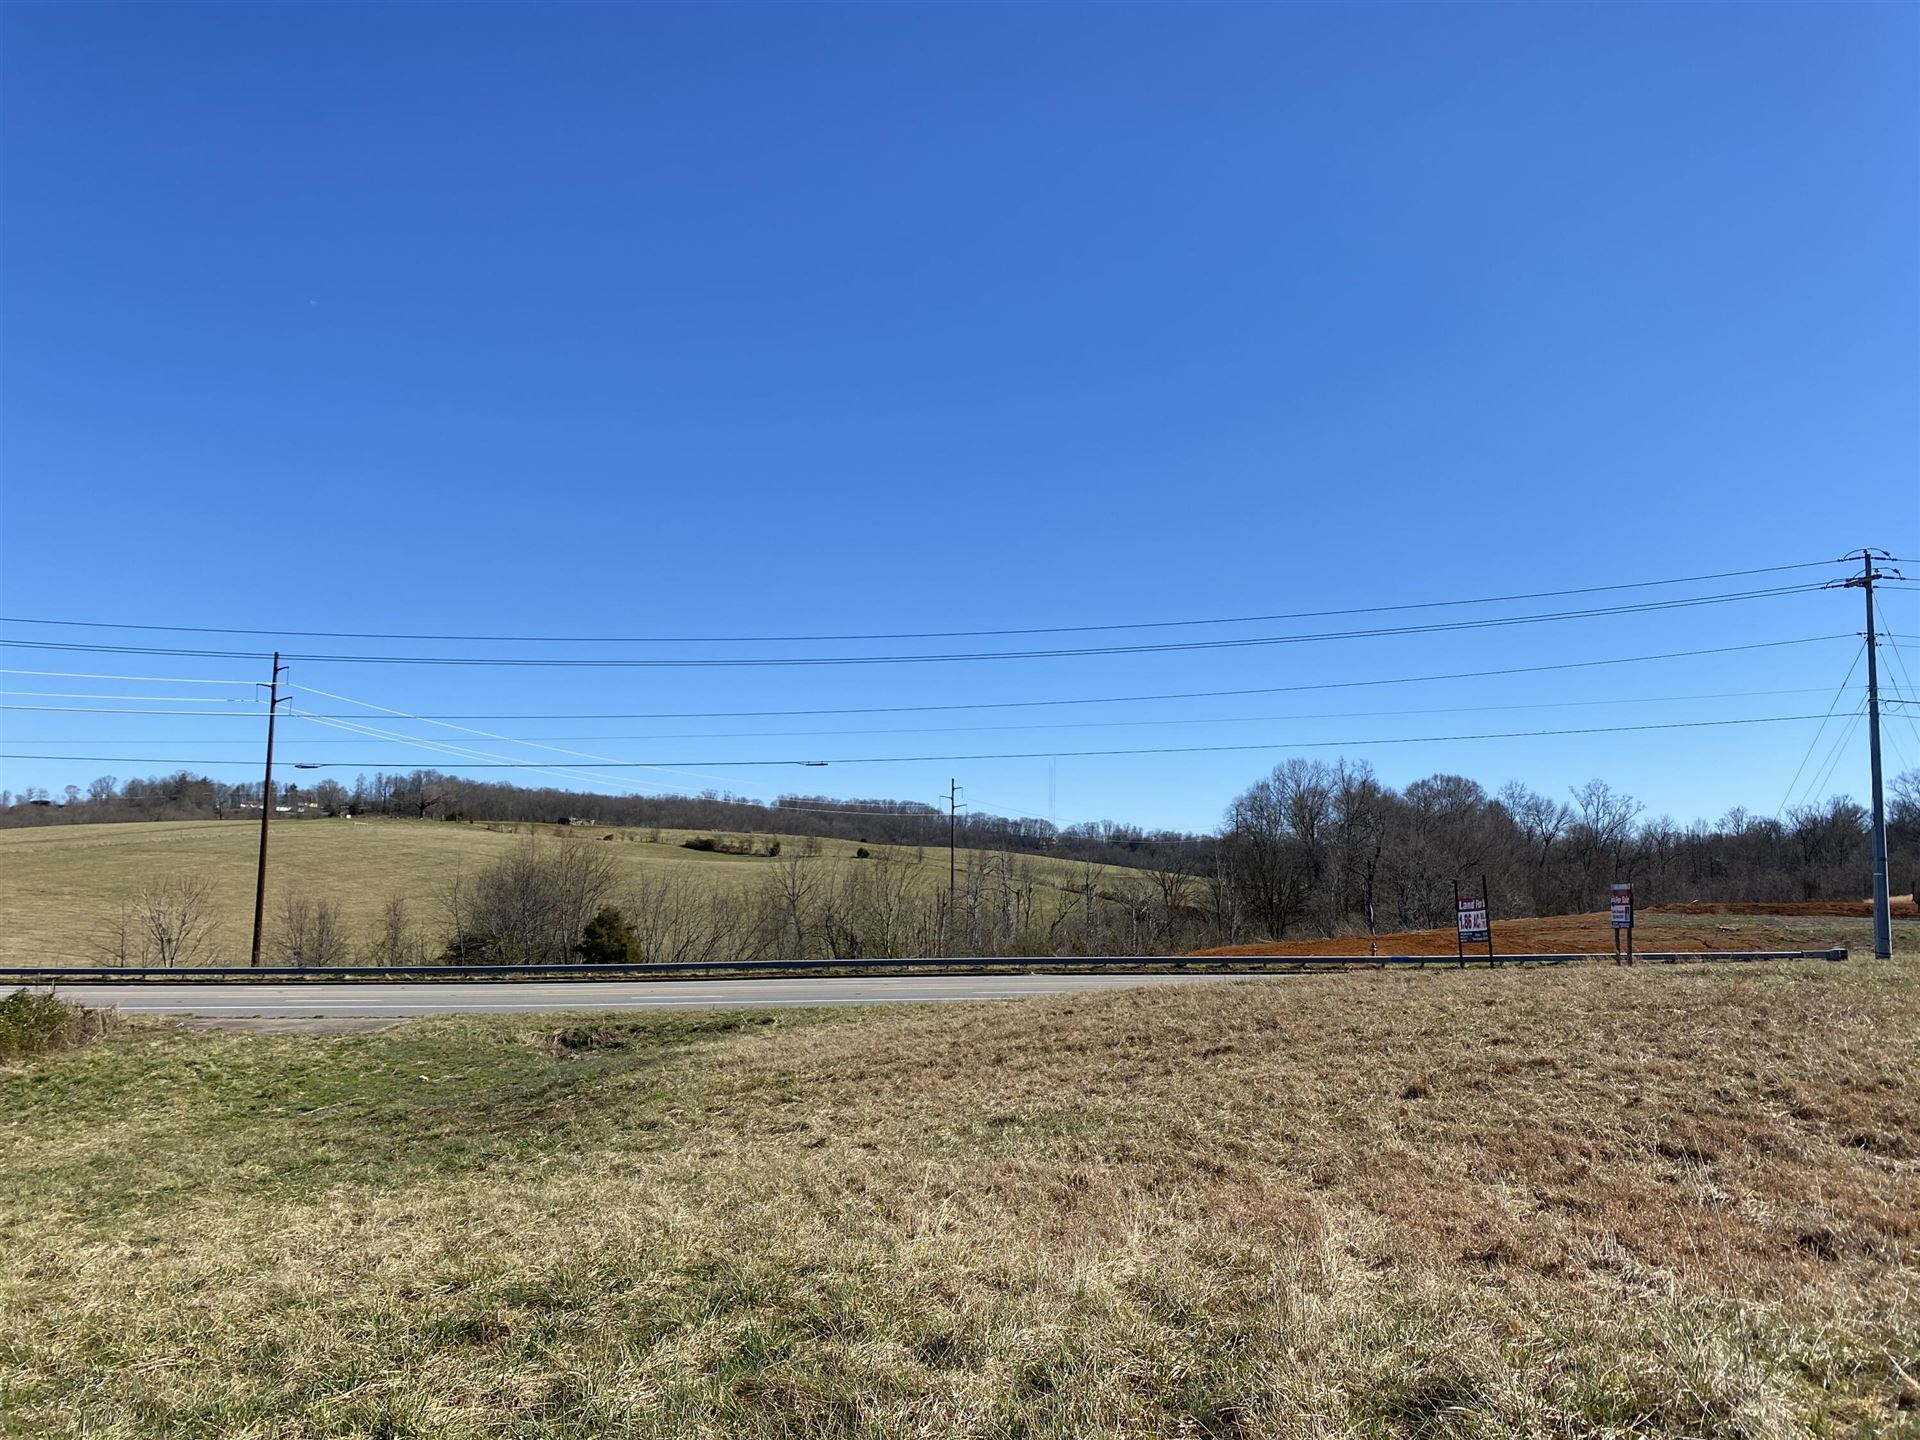 Photo of Tbd Bobby Hicks Highway, Gray, TN 37615 (MLS # 9919048)